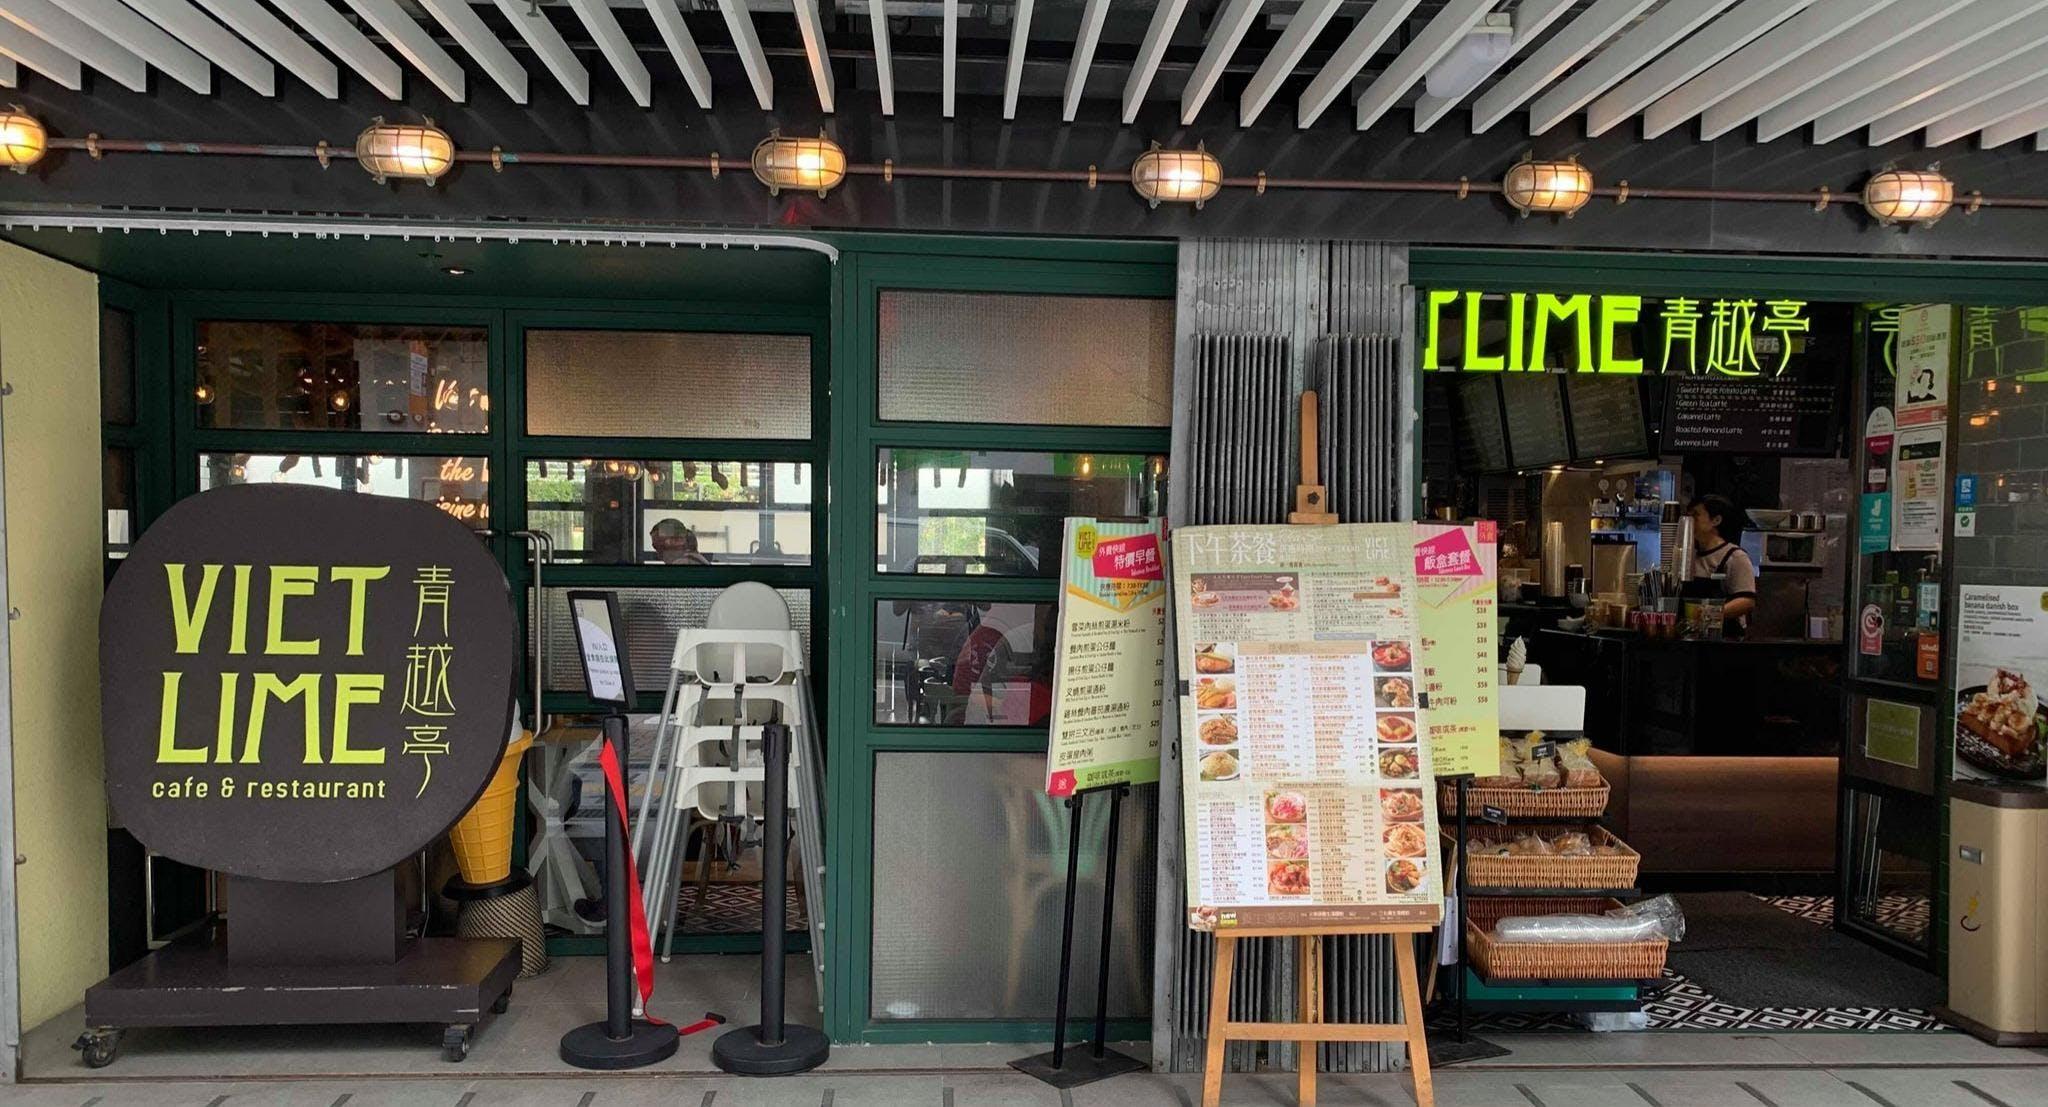 Viet Lime Cafe & Restaurant